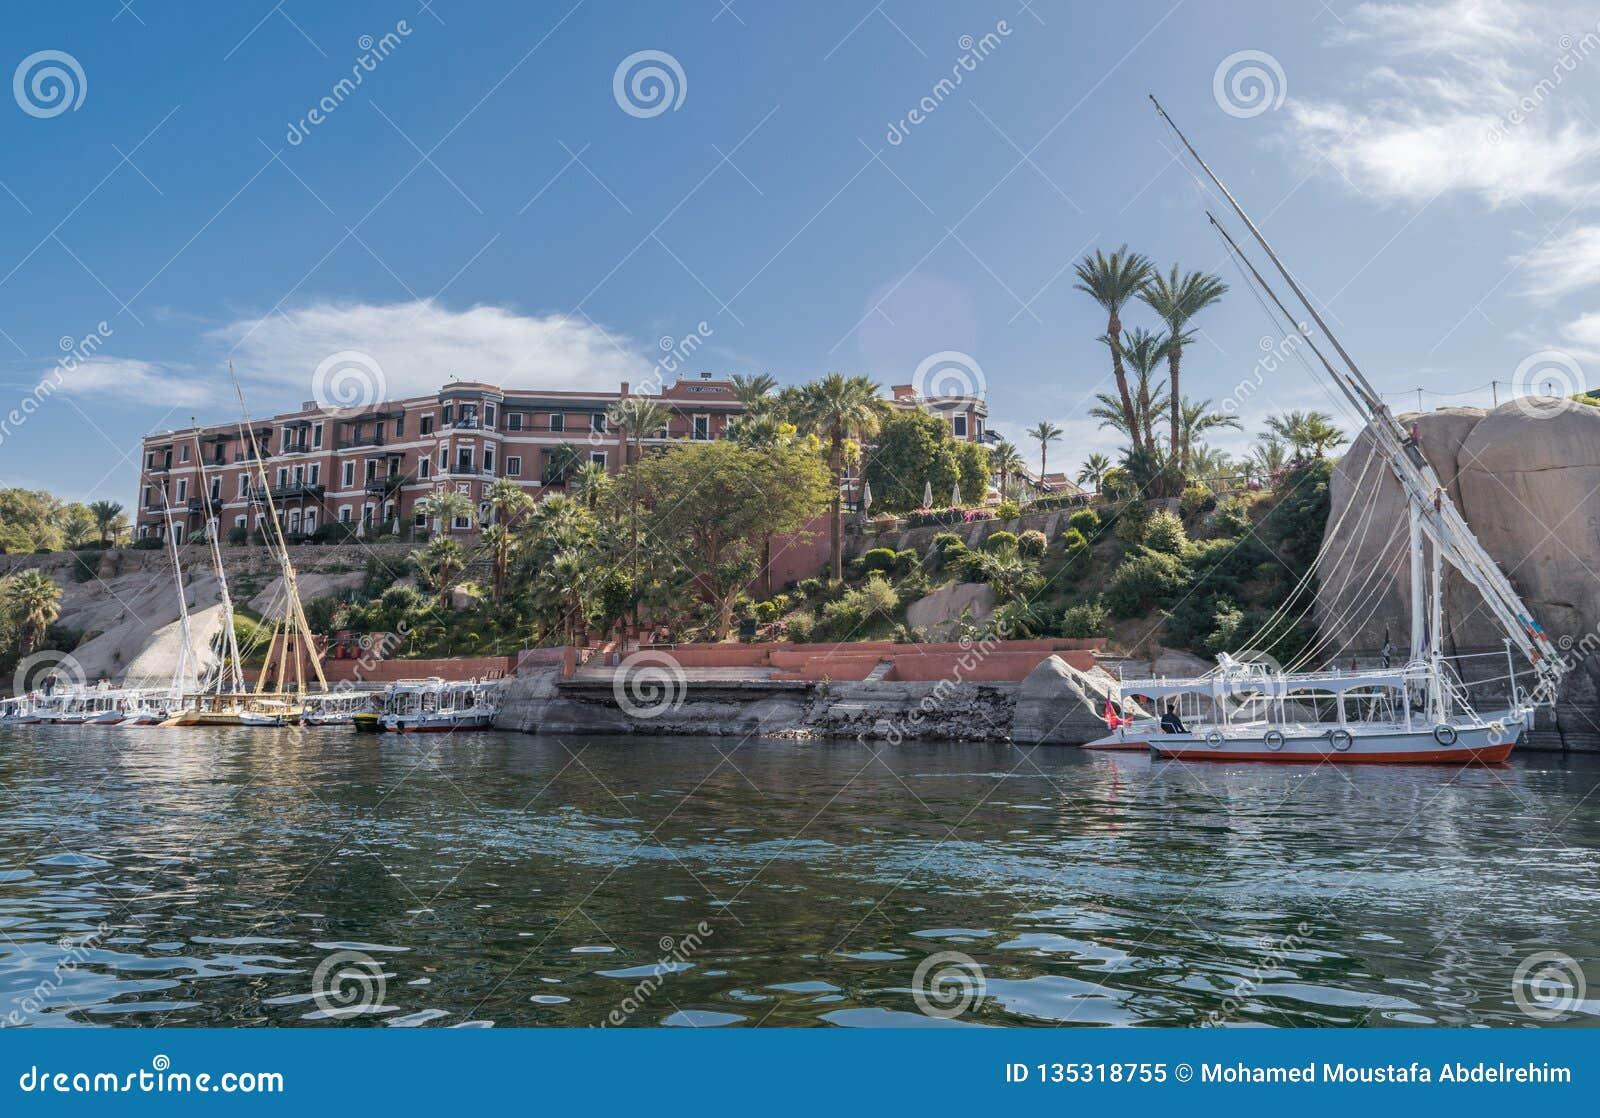 Hotelowej Sofitel legendy Stara katarakta Aswan, Egipt